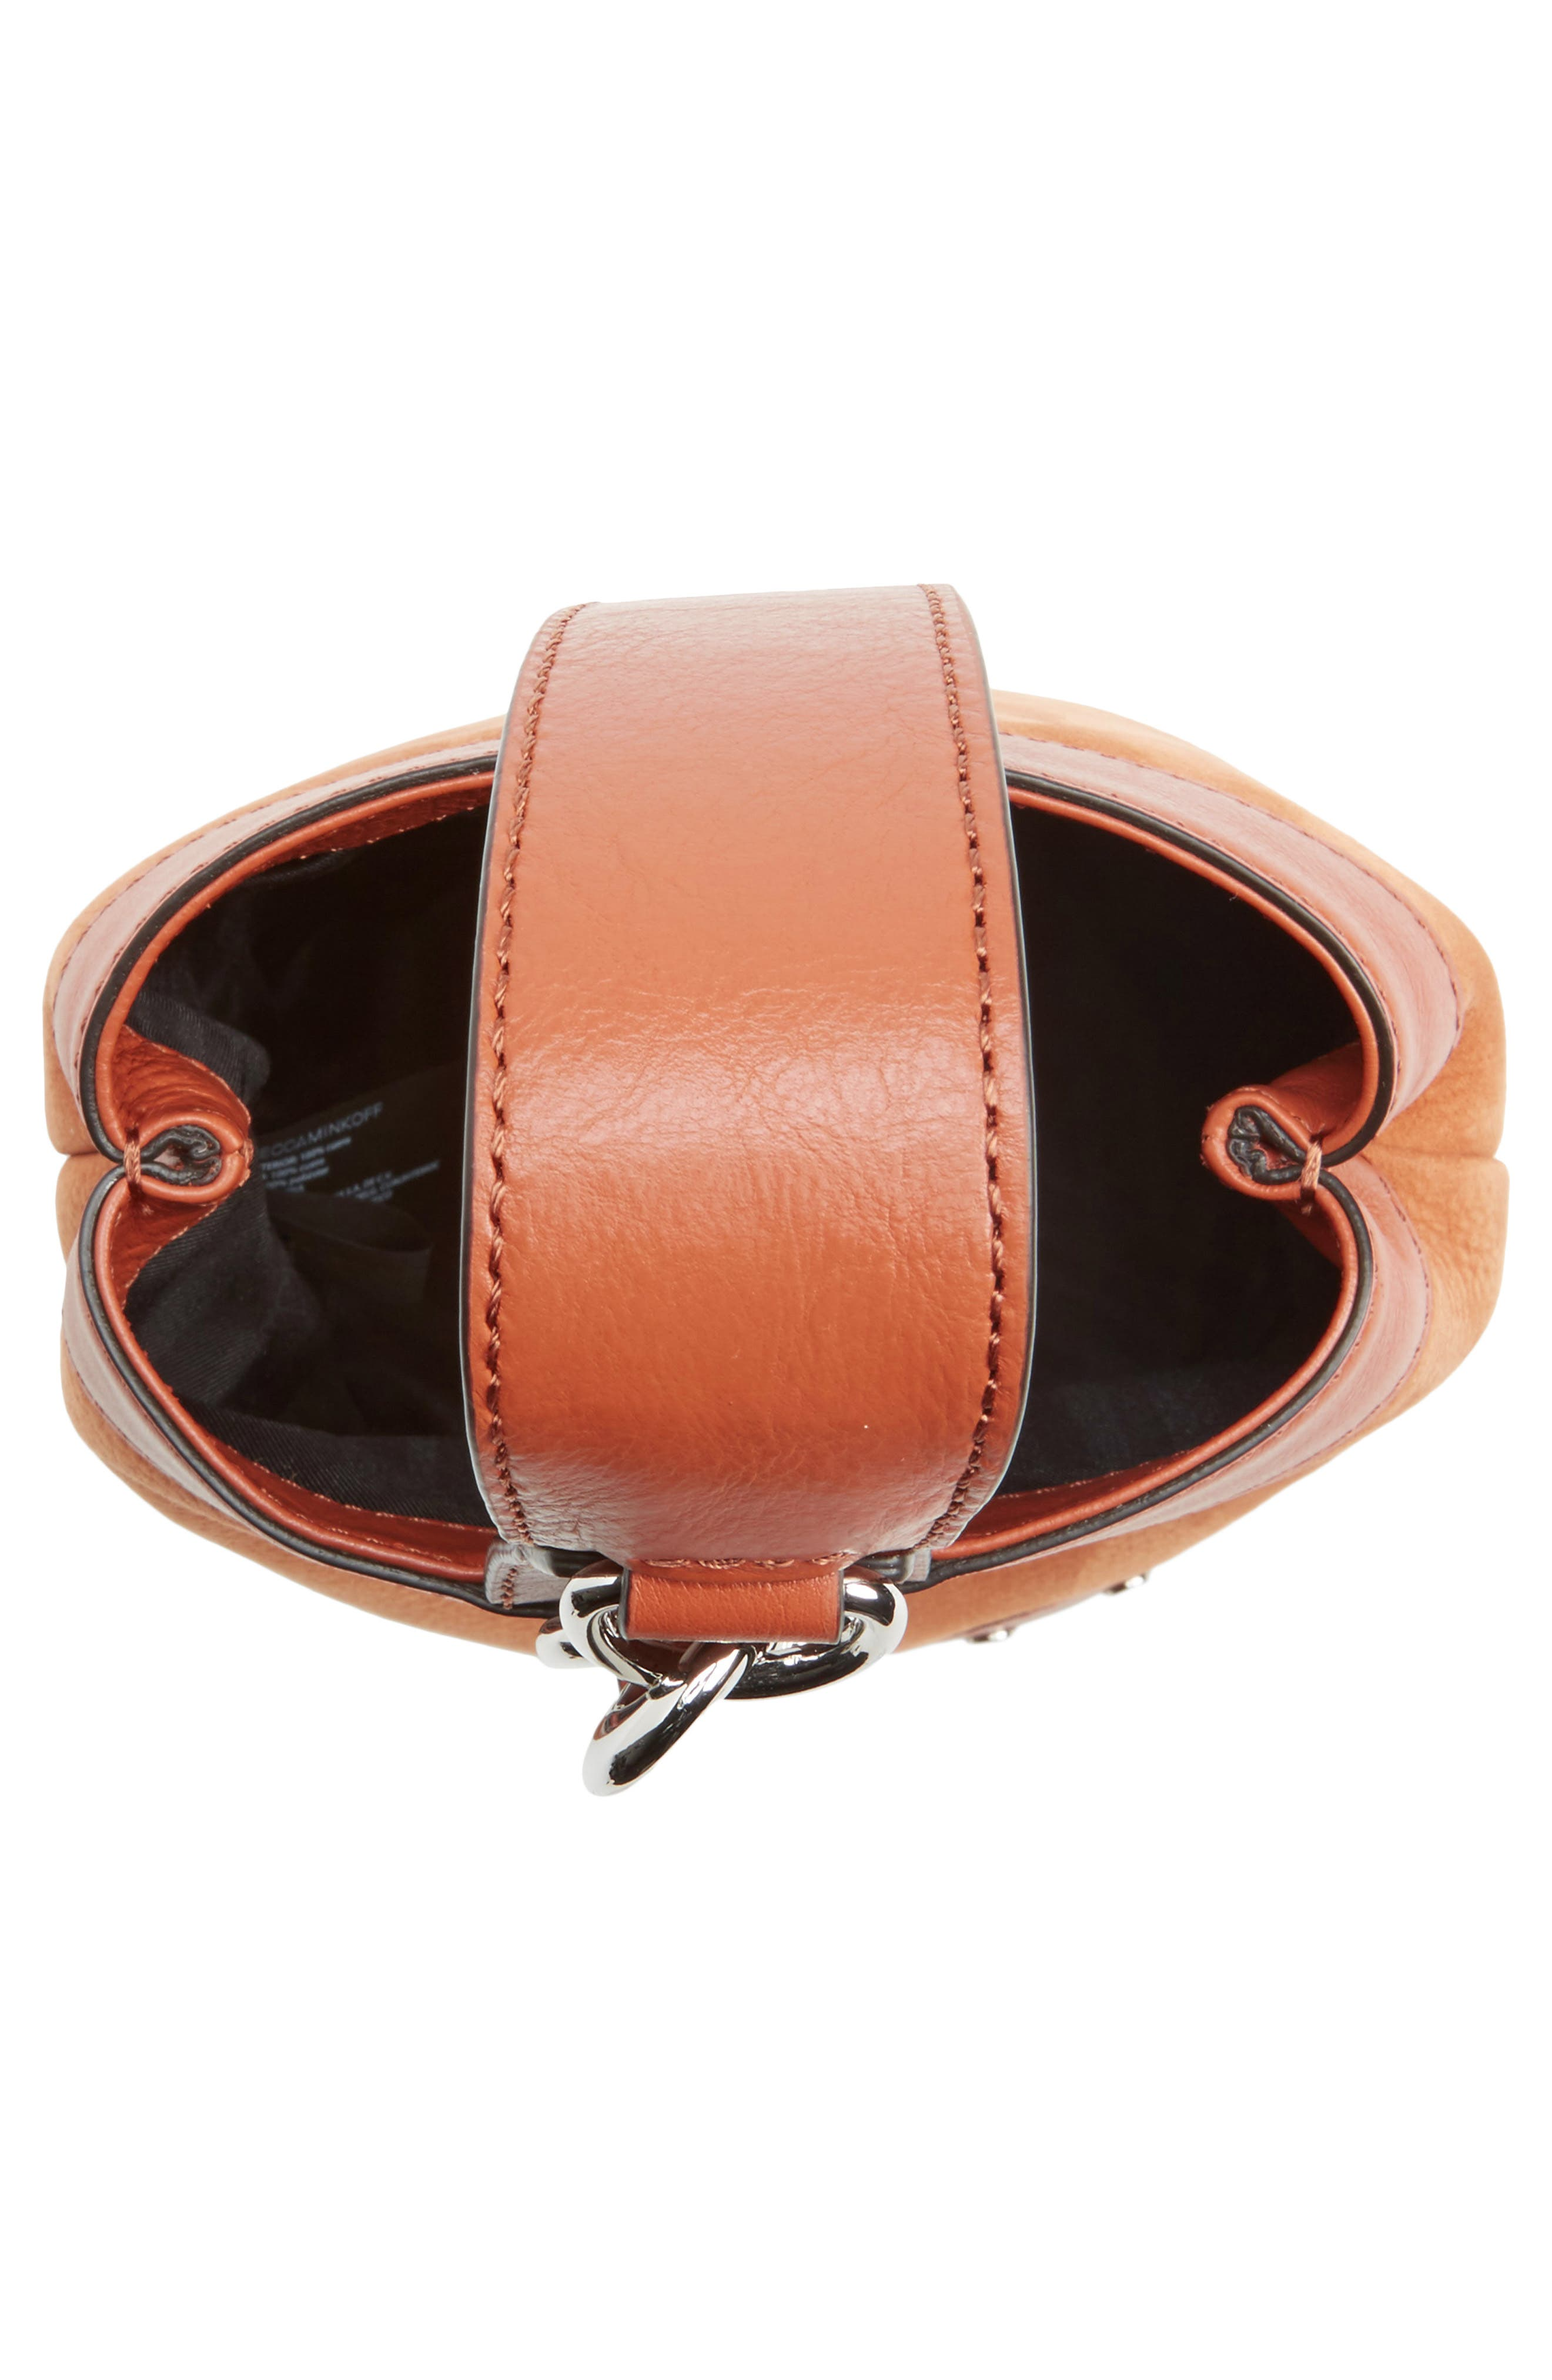 Mini Mission Leather Bucket Bag,                             Alternate thumbnail 4, color,                             200